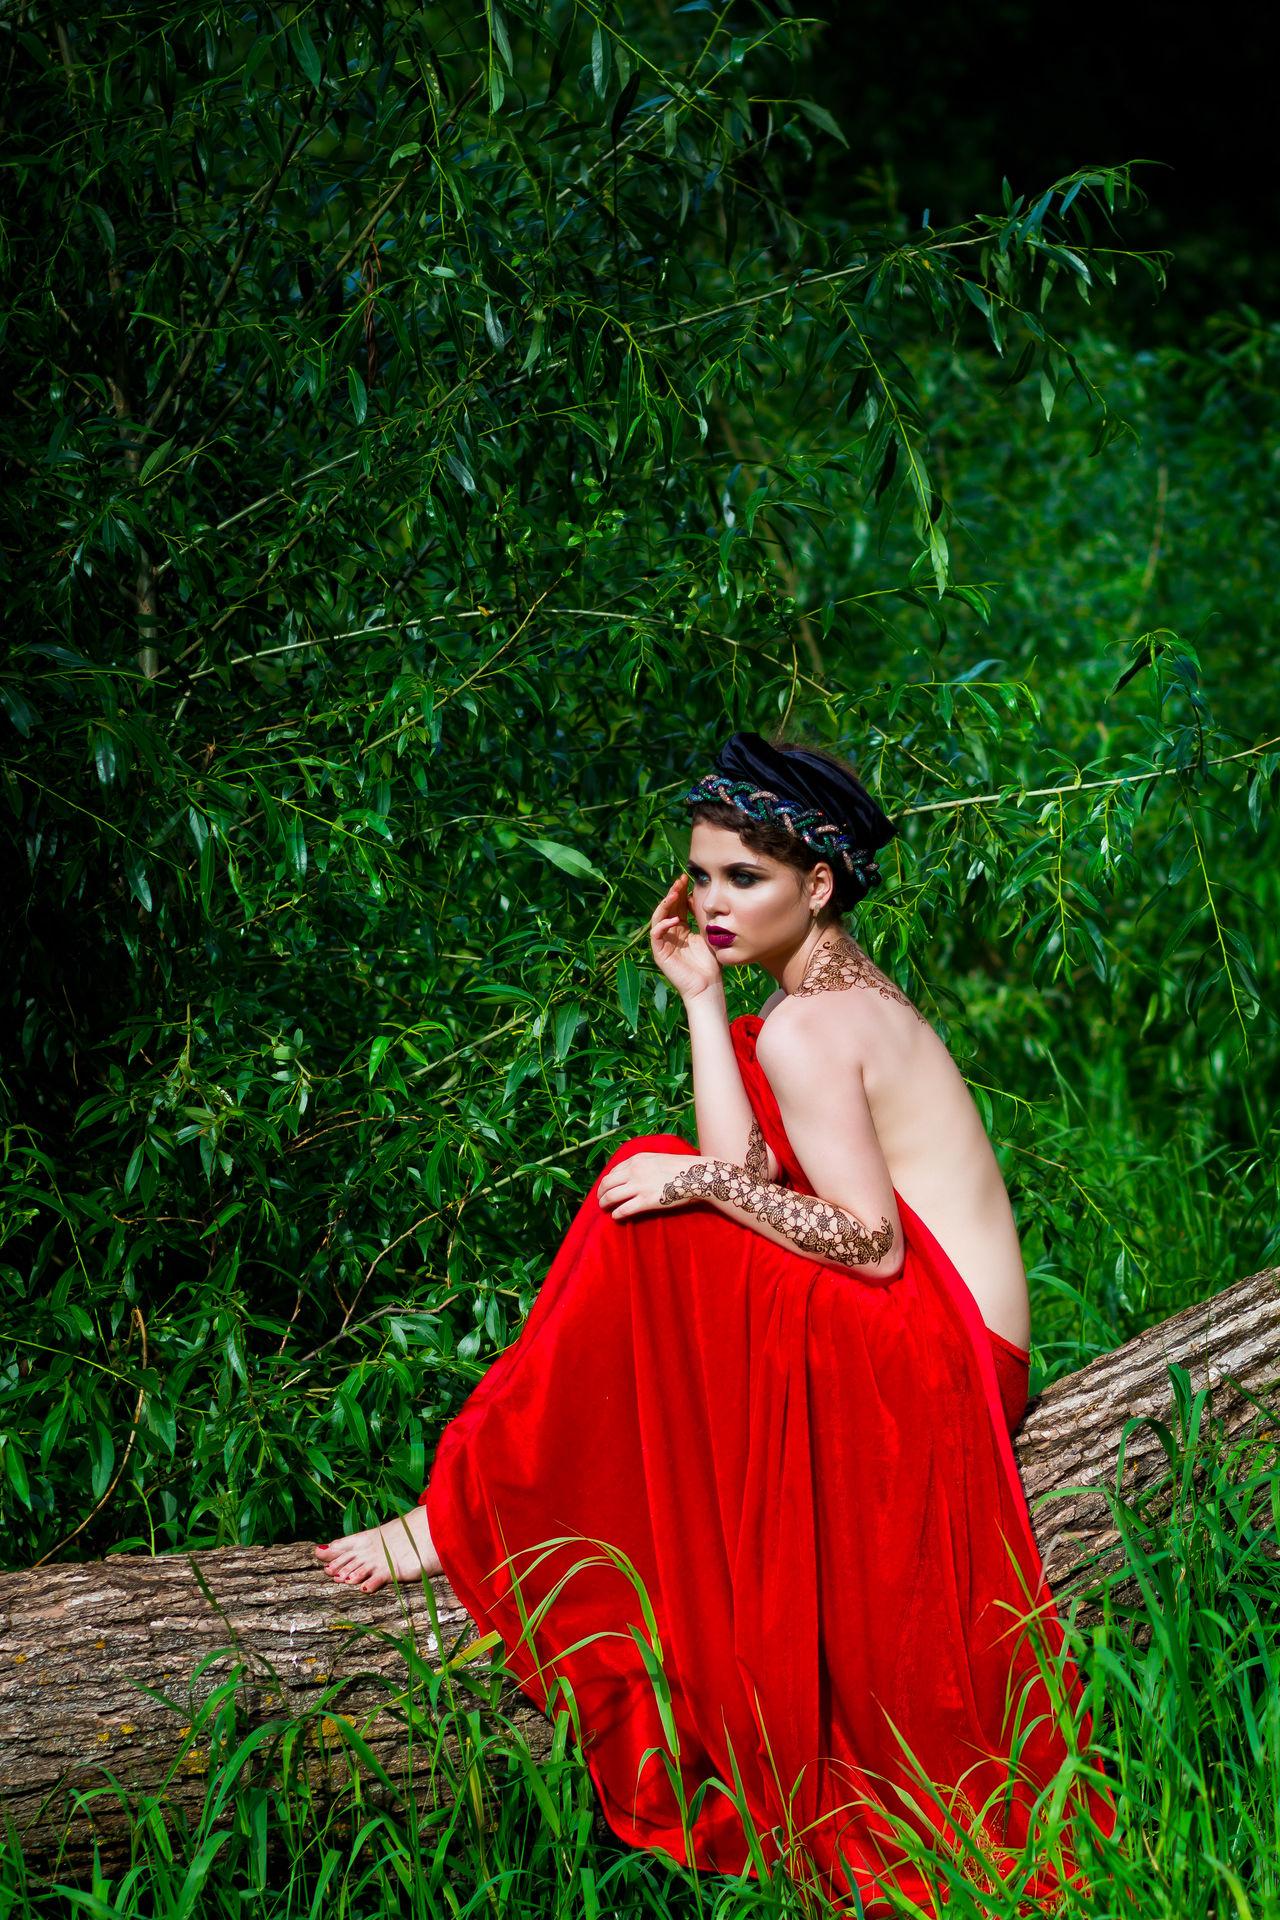 Beauty Beauty In Nature Girl Green Leaves Mehendi Mehendi Art Red Showcase July Trees